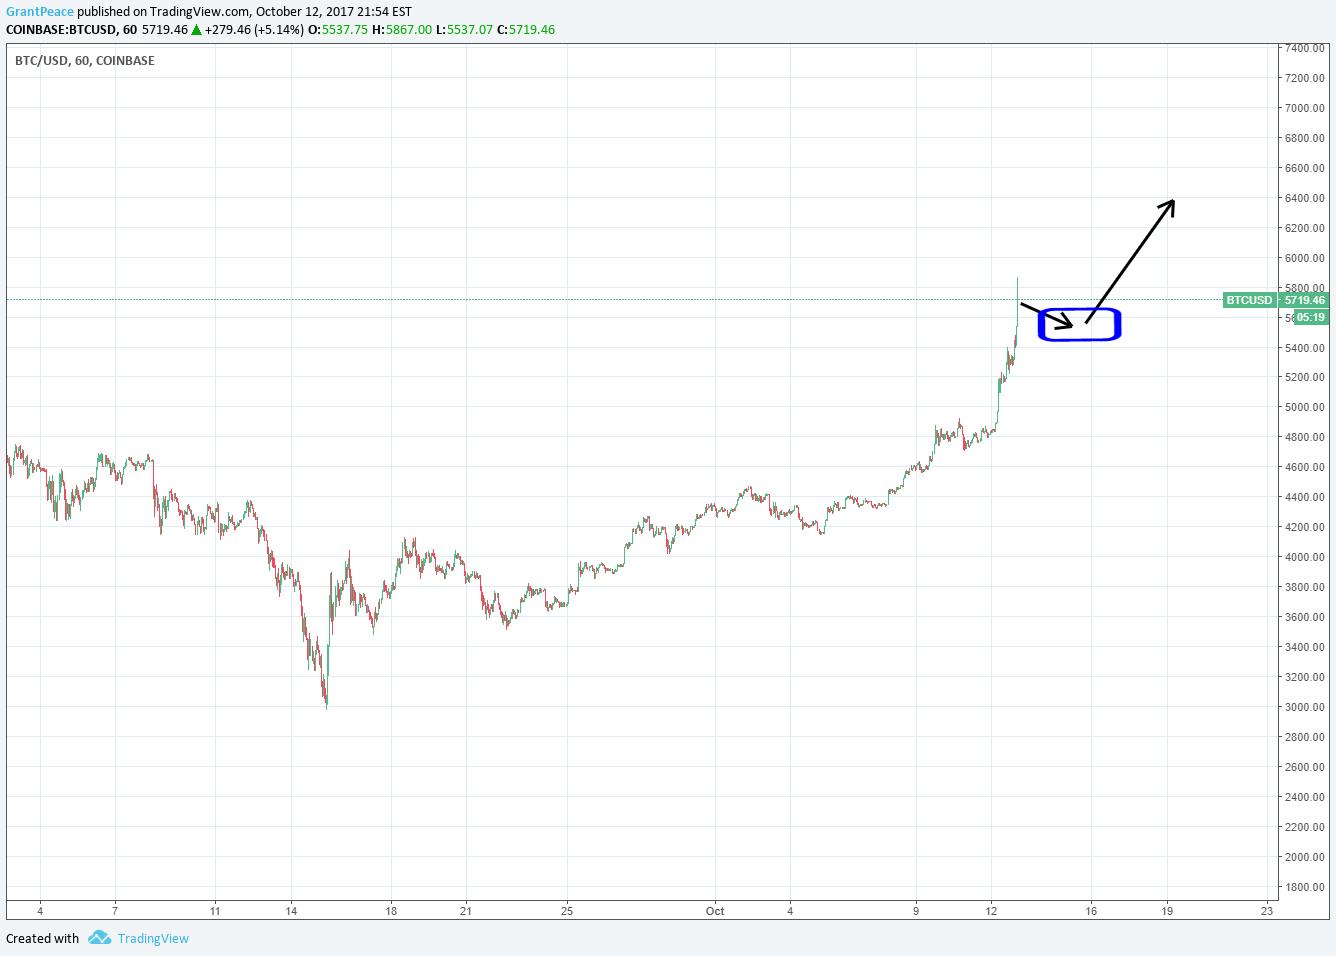 Bitcoin script trading view